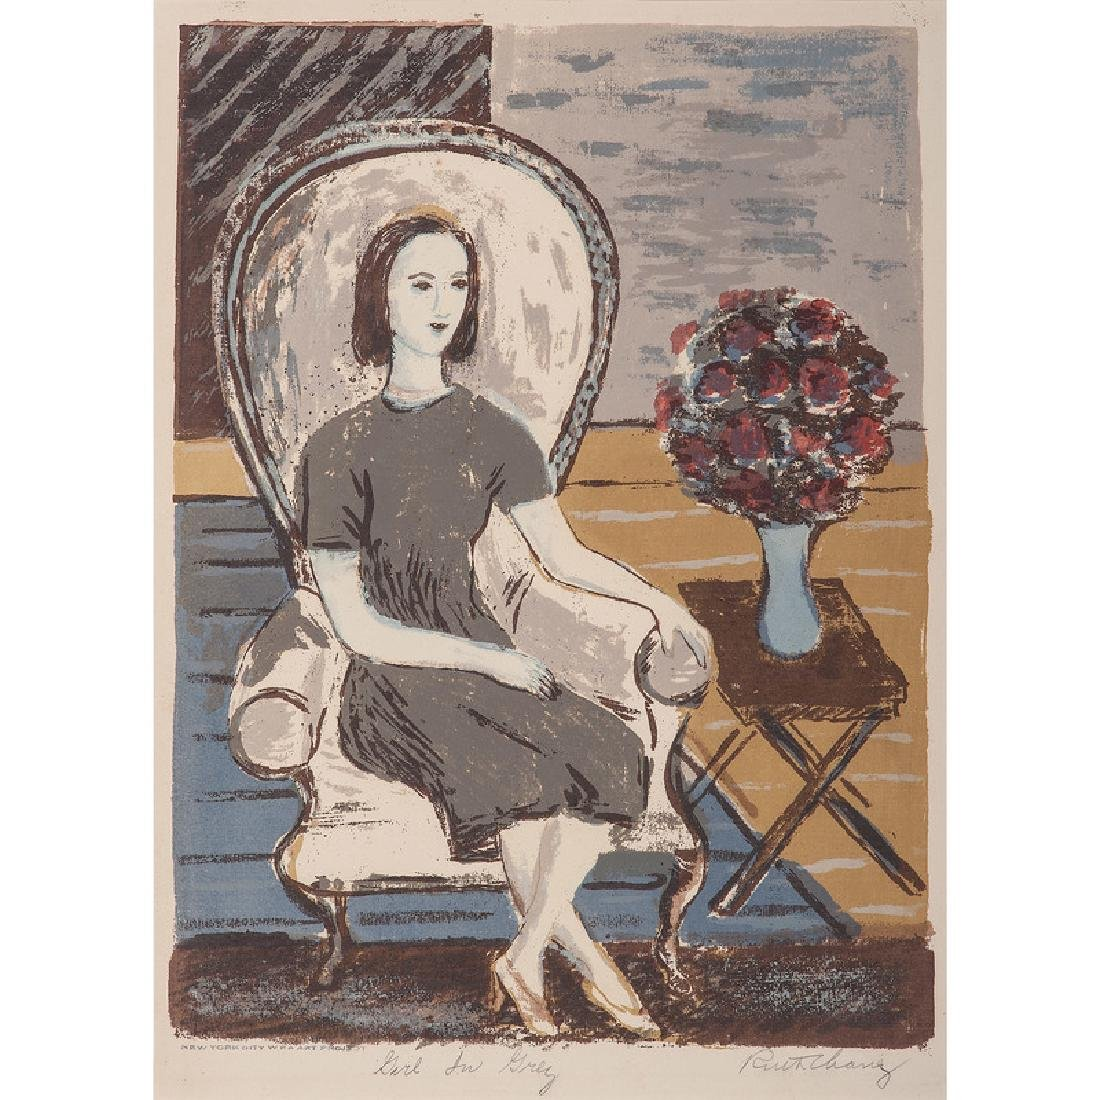 Ruth Chaney (American, 1908-1973)